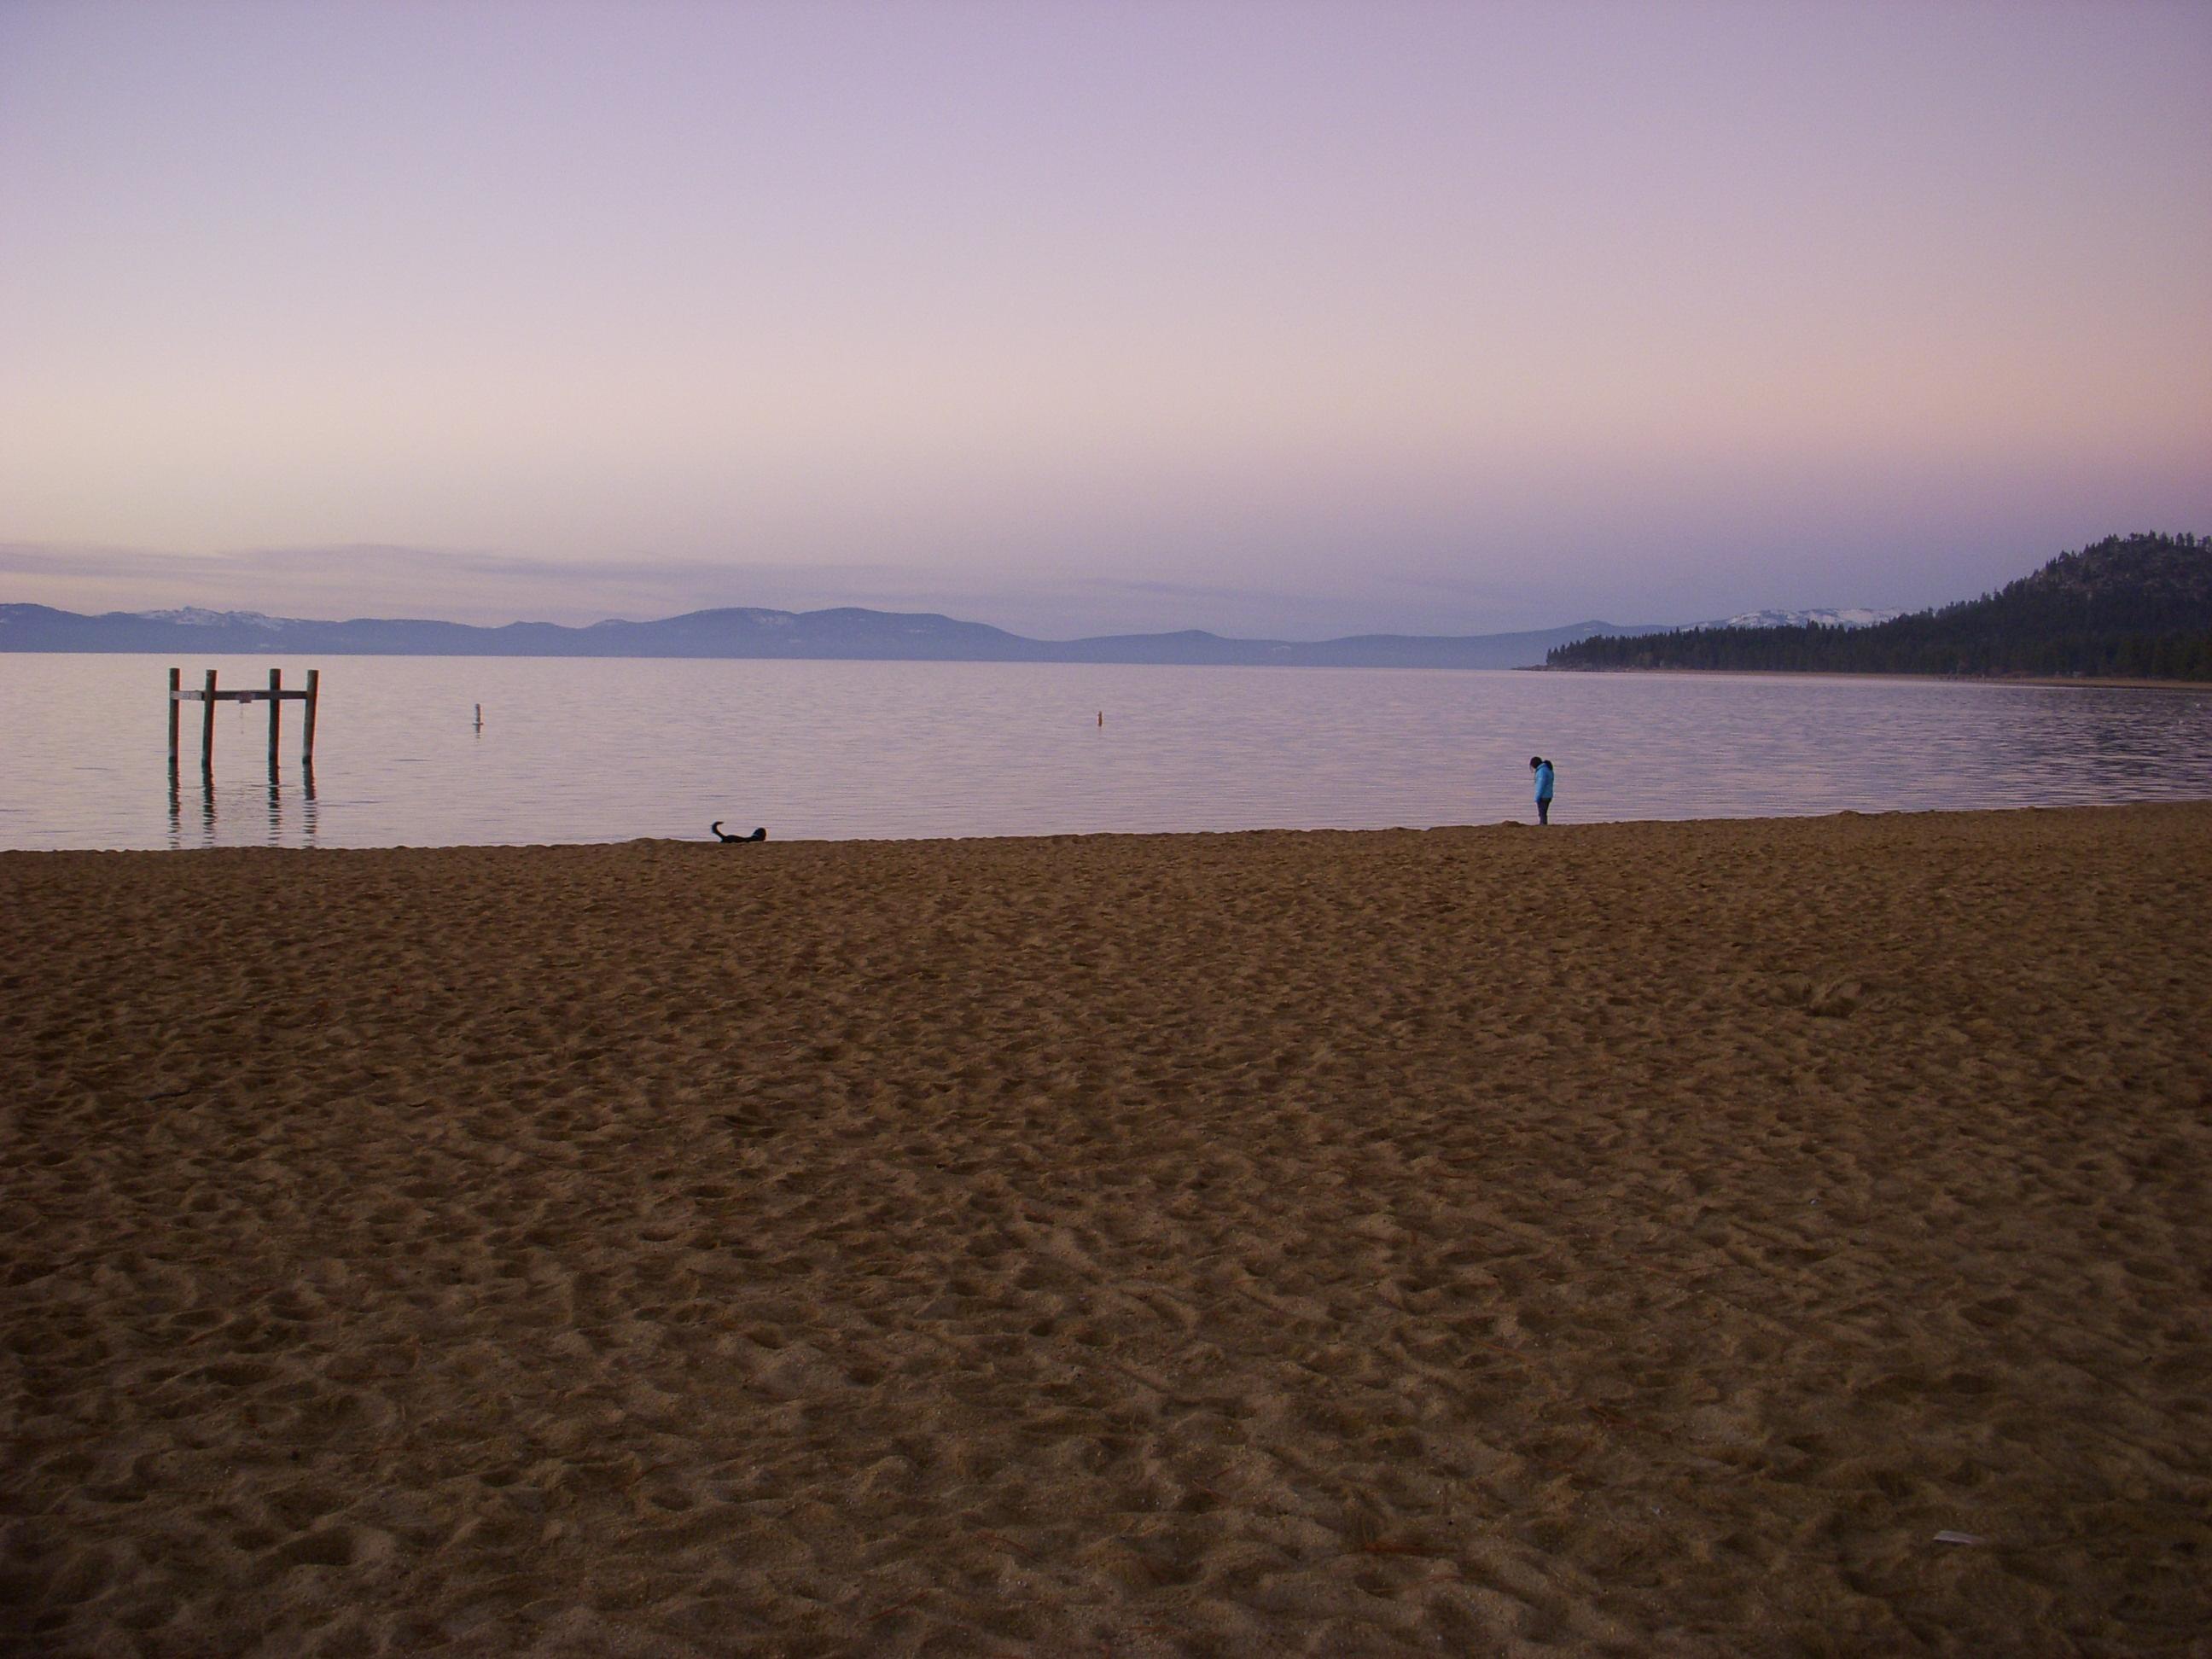 por-do-sol-lake-tahoe